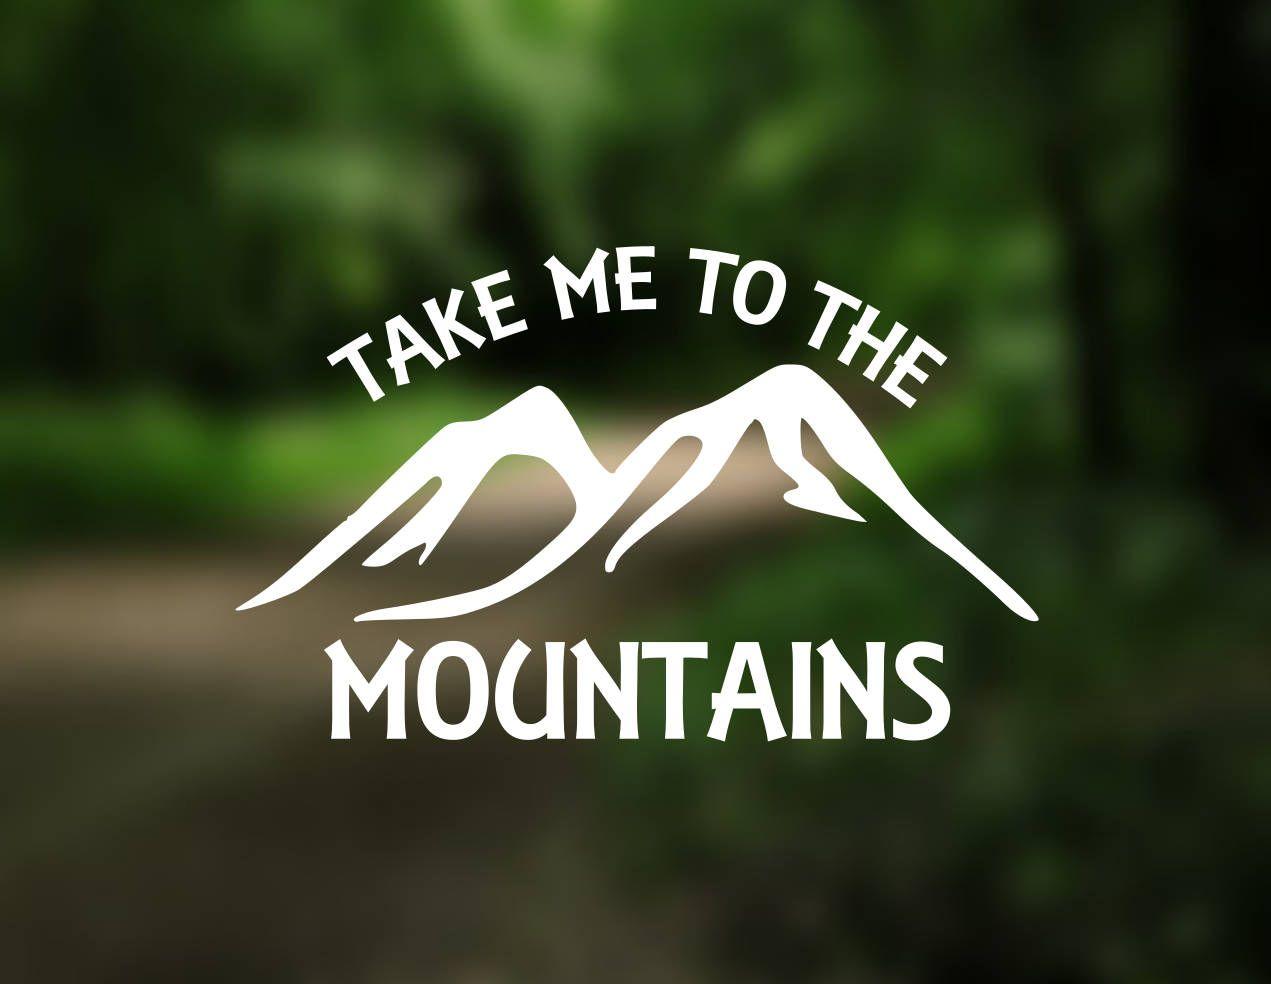 ETIQUETA Llévame a las montañas etiqueta del vinilo Coches